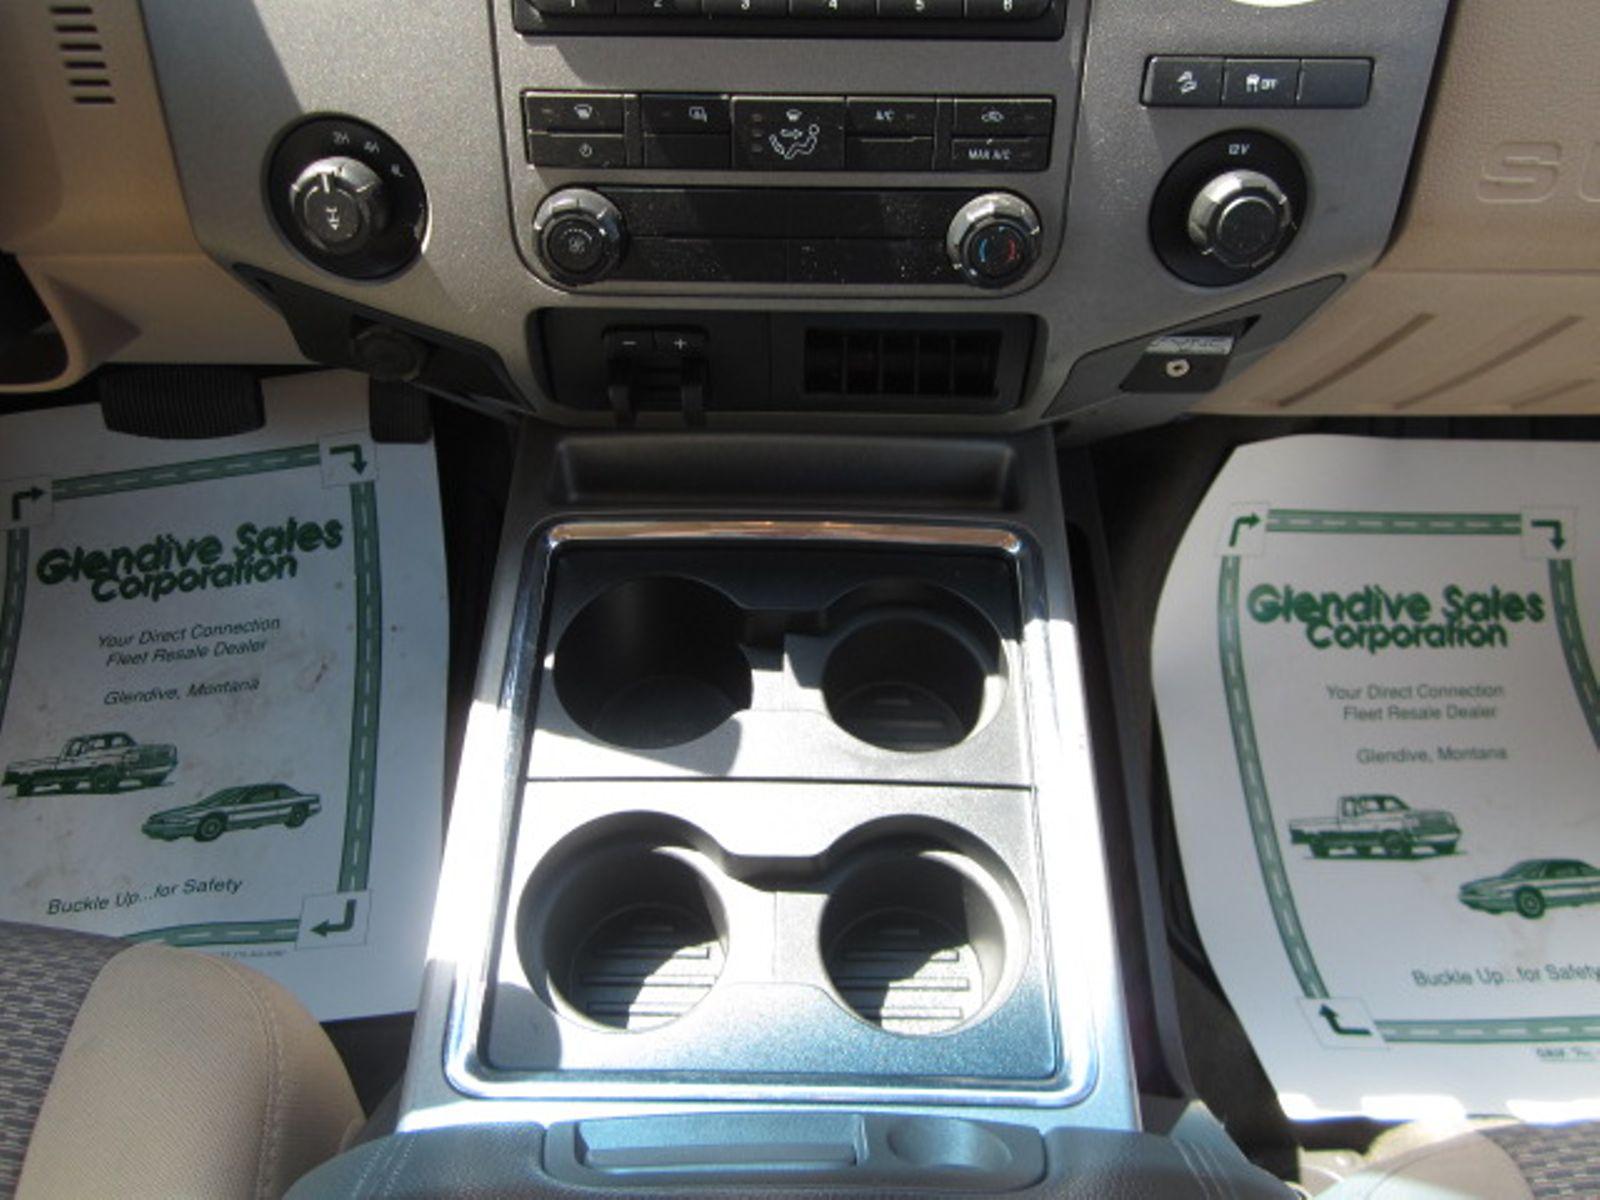 2011 ford super duty f 350 srw pickup xlt glendive mt glendive sales corp in  [ 1600 x 1200 Pixel ]